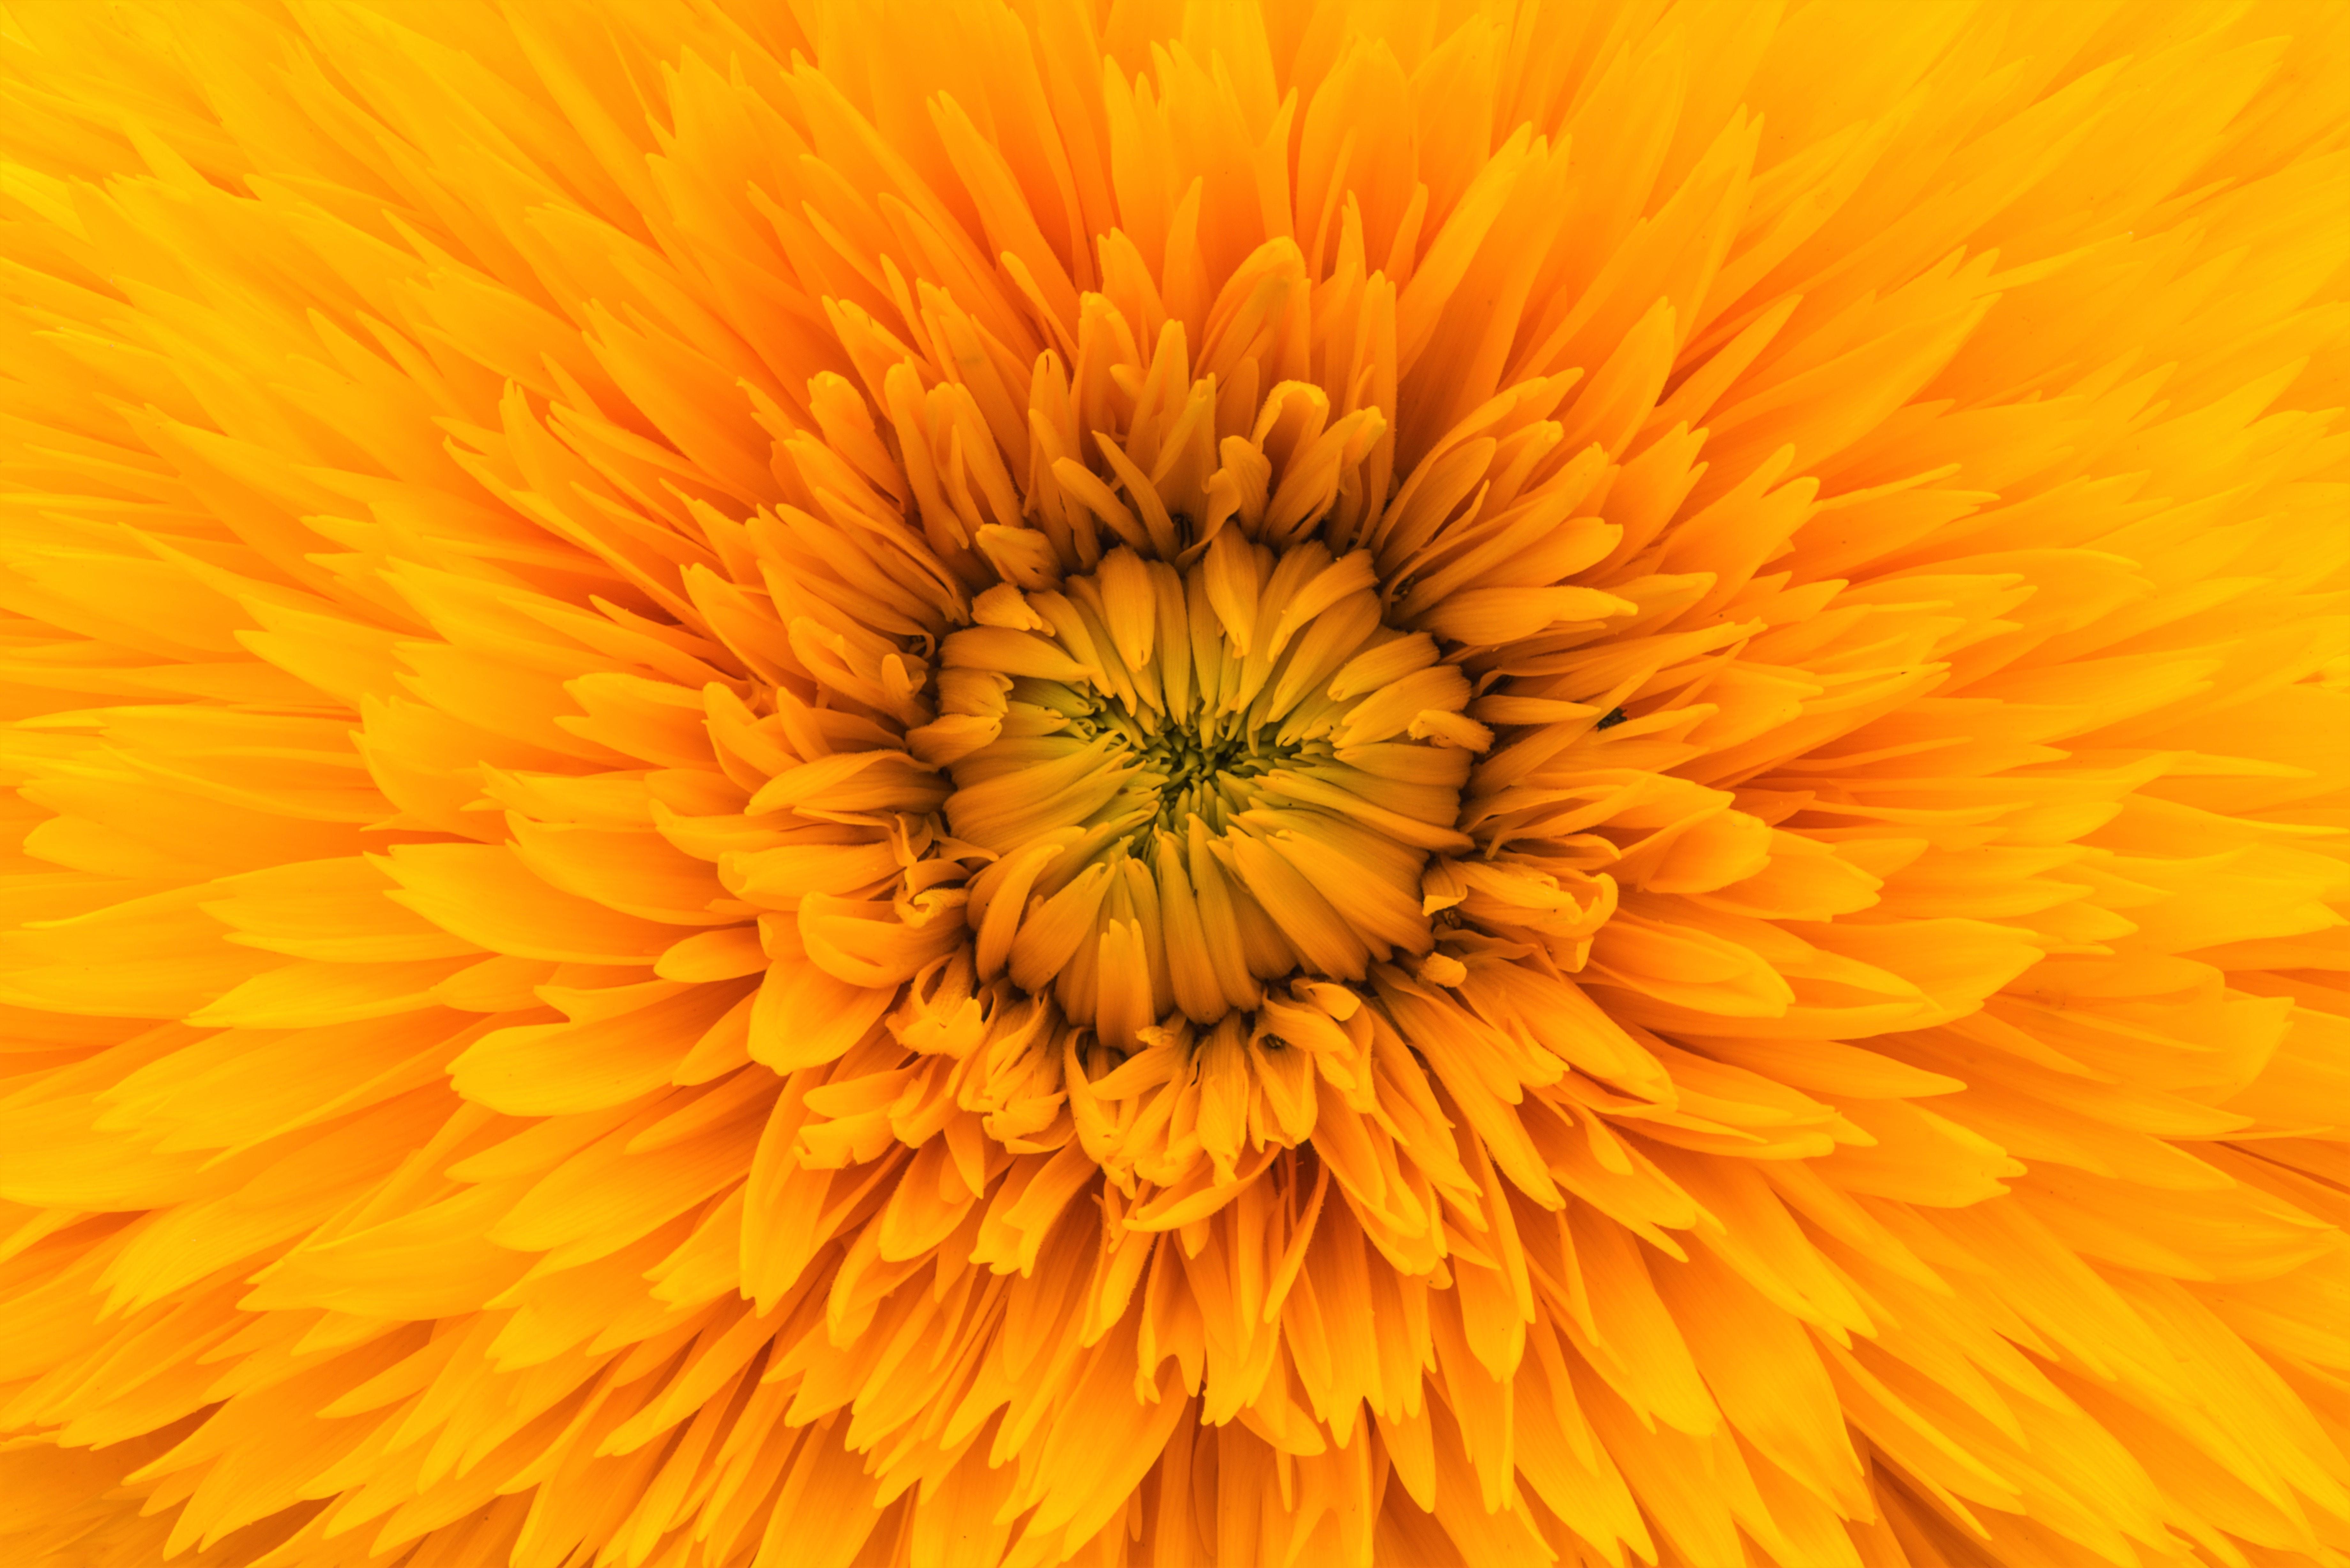 Golden Flower 5k Retina Ultra HD Wallpaper | Background Image